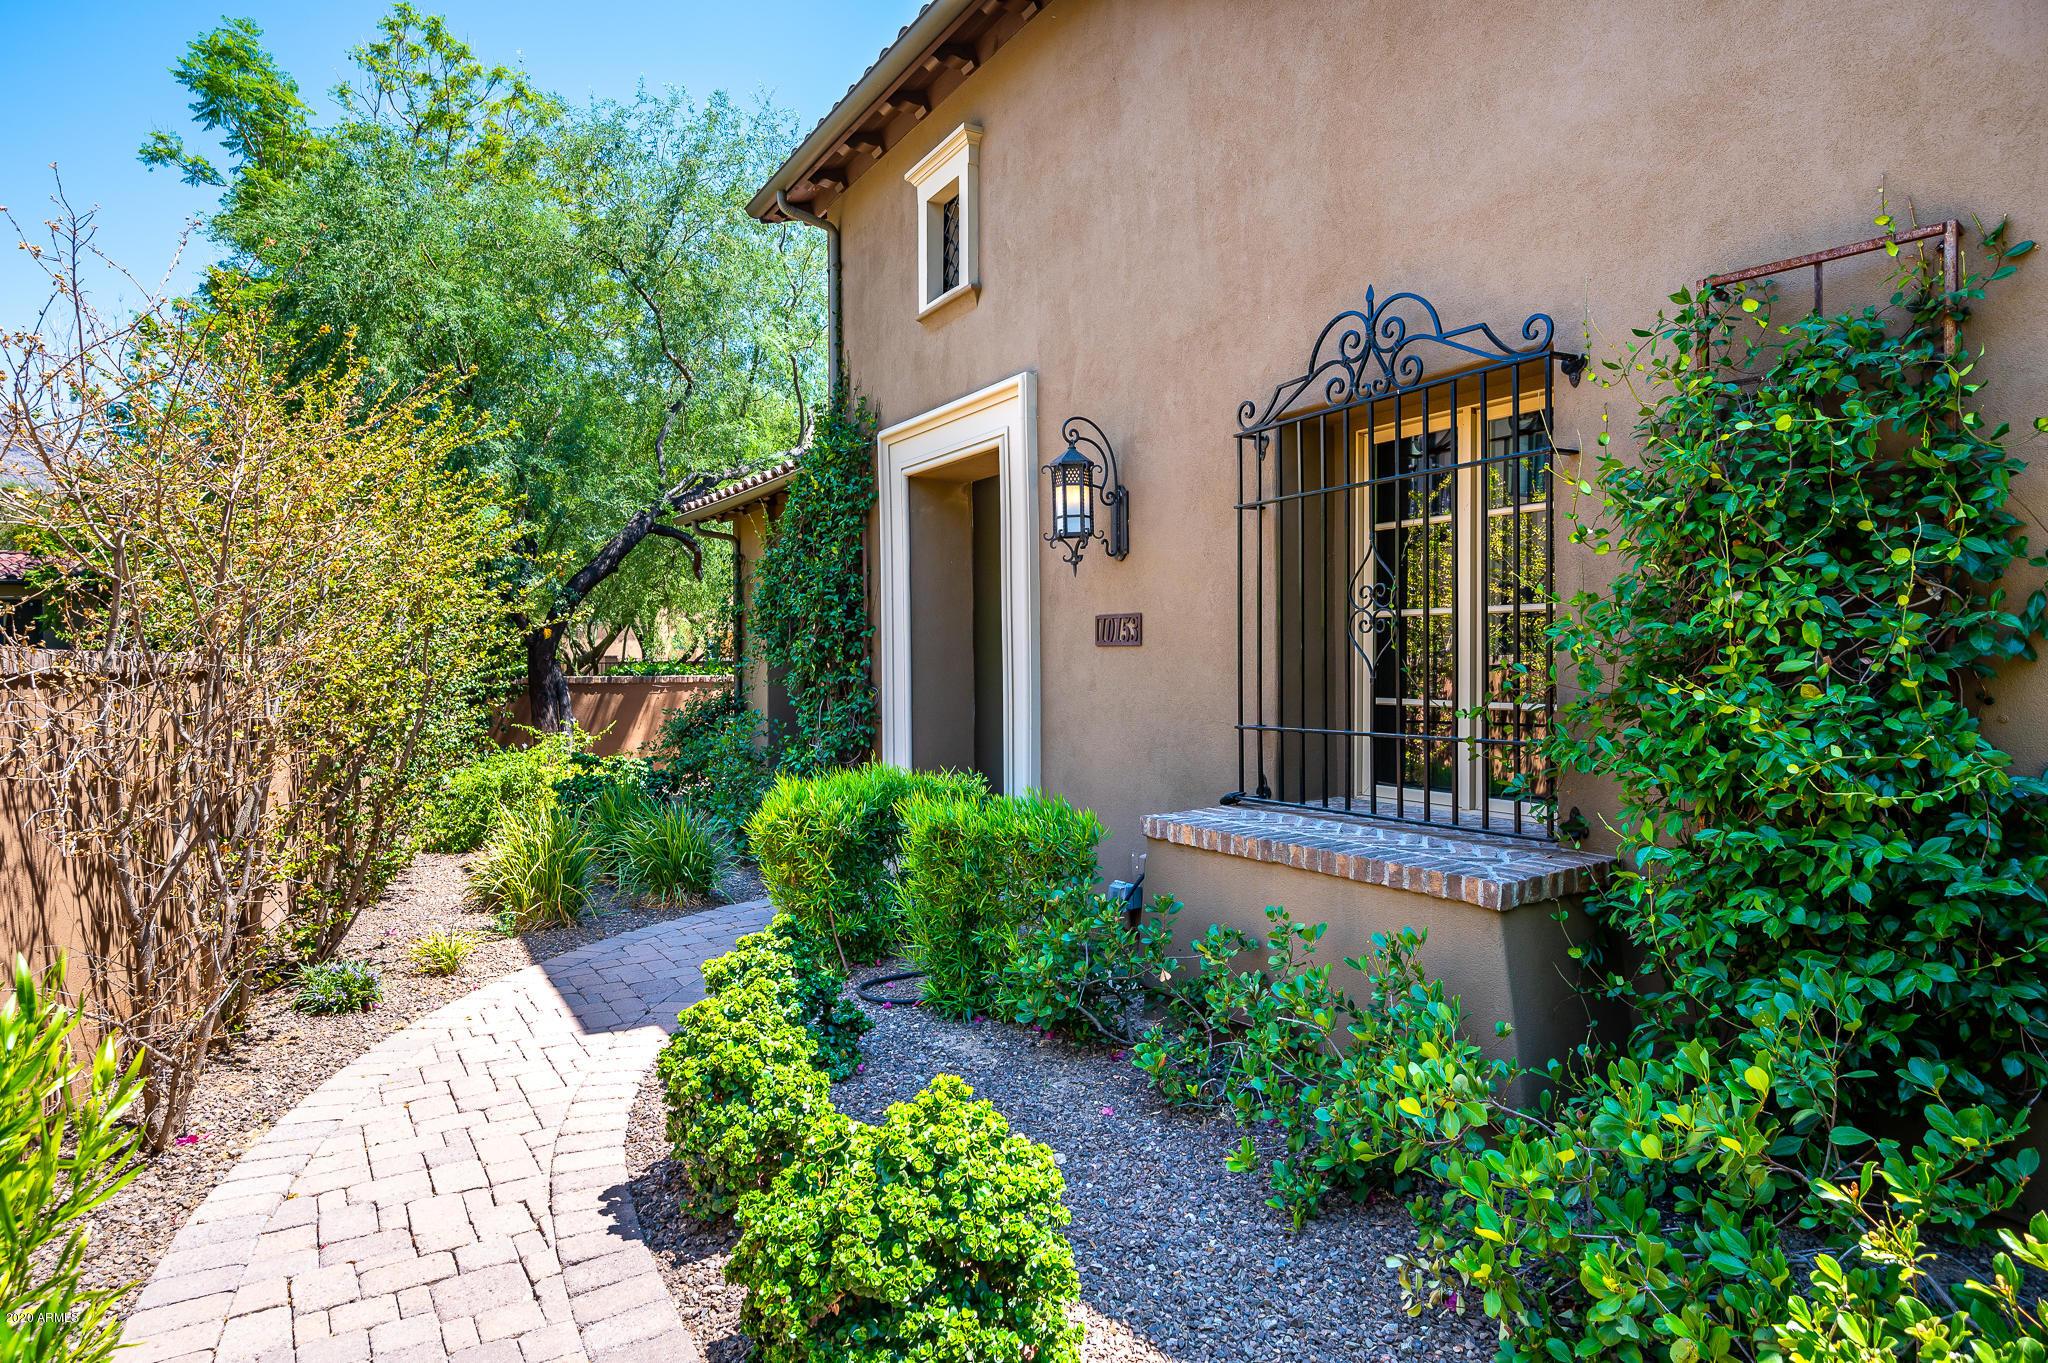 10153 PHANTOM Way, Scottsdale, Arizona 85255, 5 Bedrooms Bedrooms, ,5.5 BathroomsBathrooms,Residential,For Sale,PHANTOM,6119077